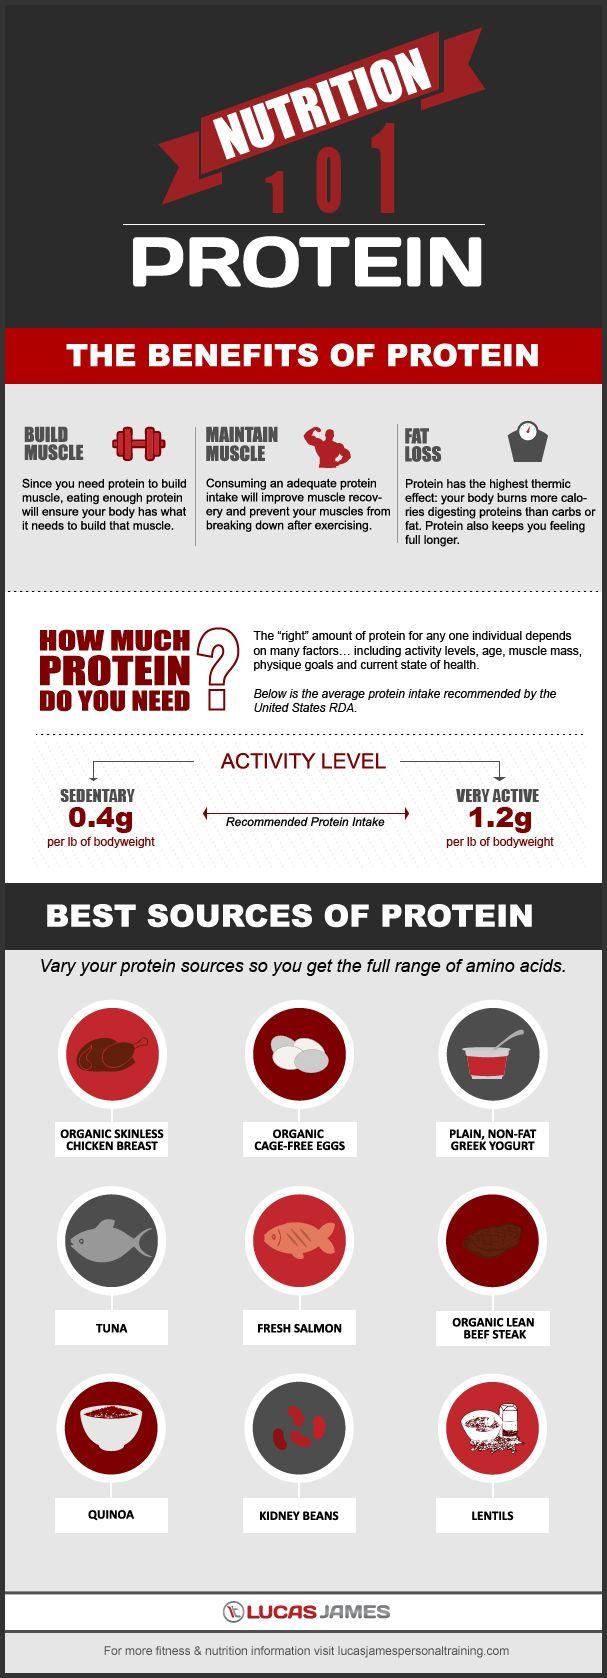 Nutrition 101: Protein | Health | Fitness |Workout | Diet | Weightloss | Lucas James Celebrity Trainer | Scottsdale | Arizona